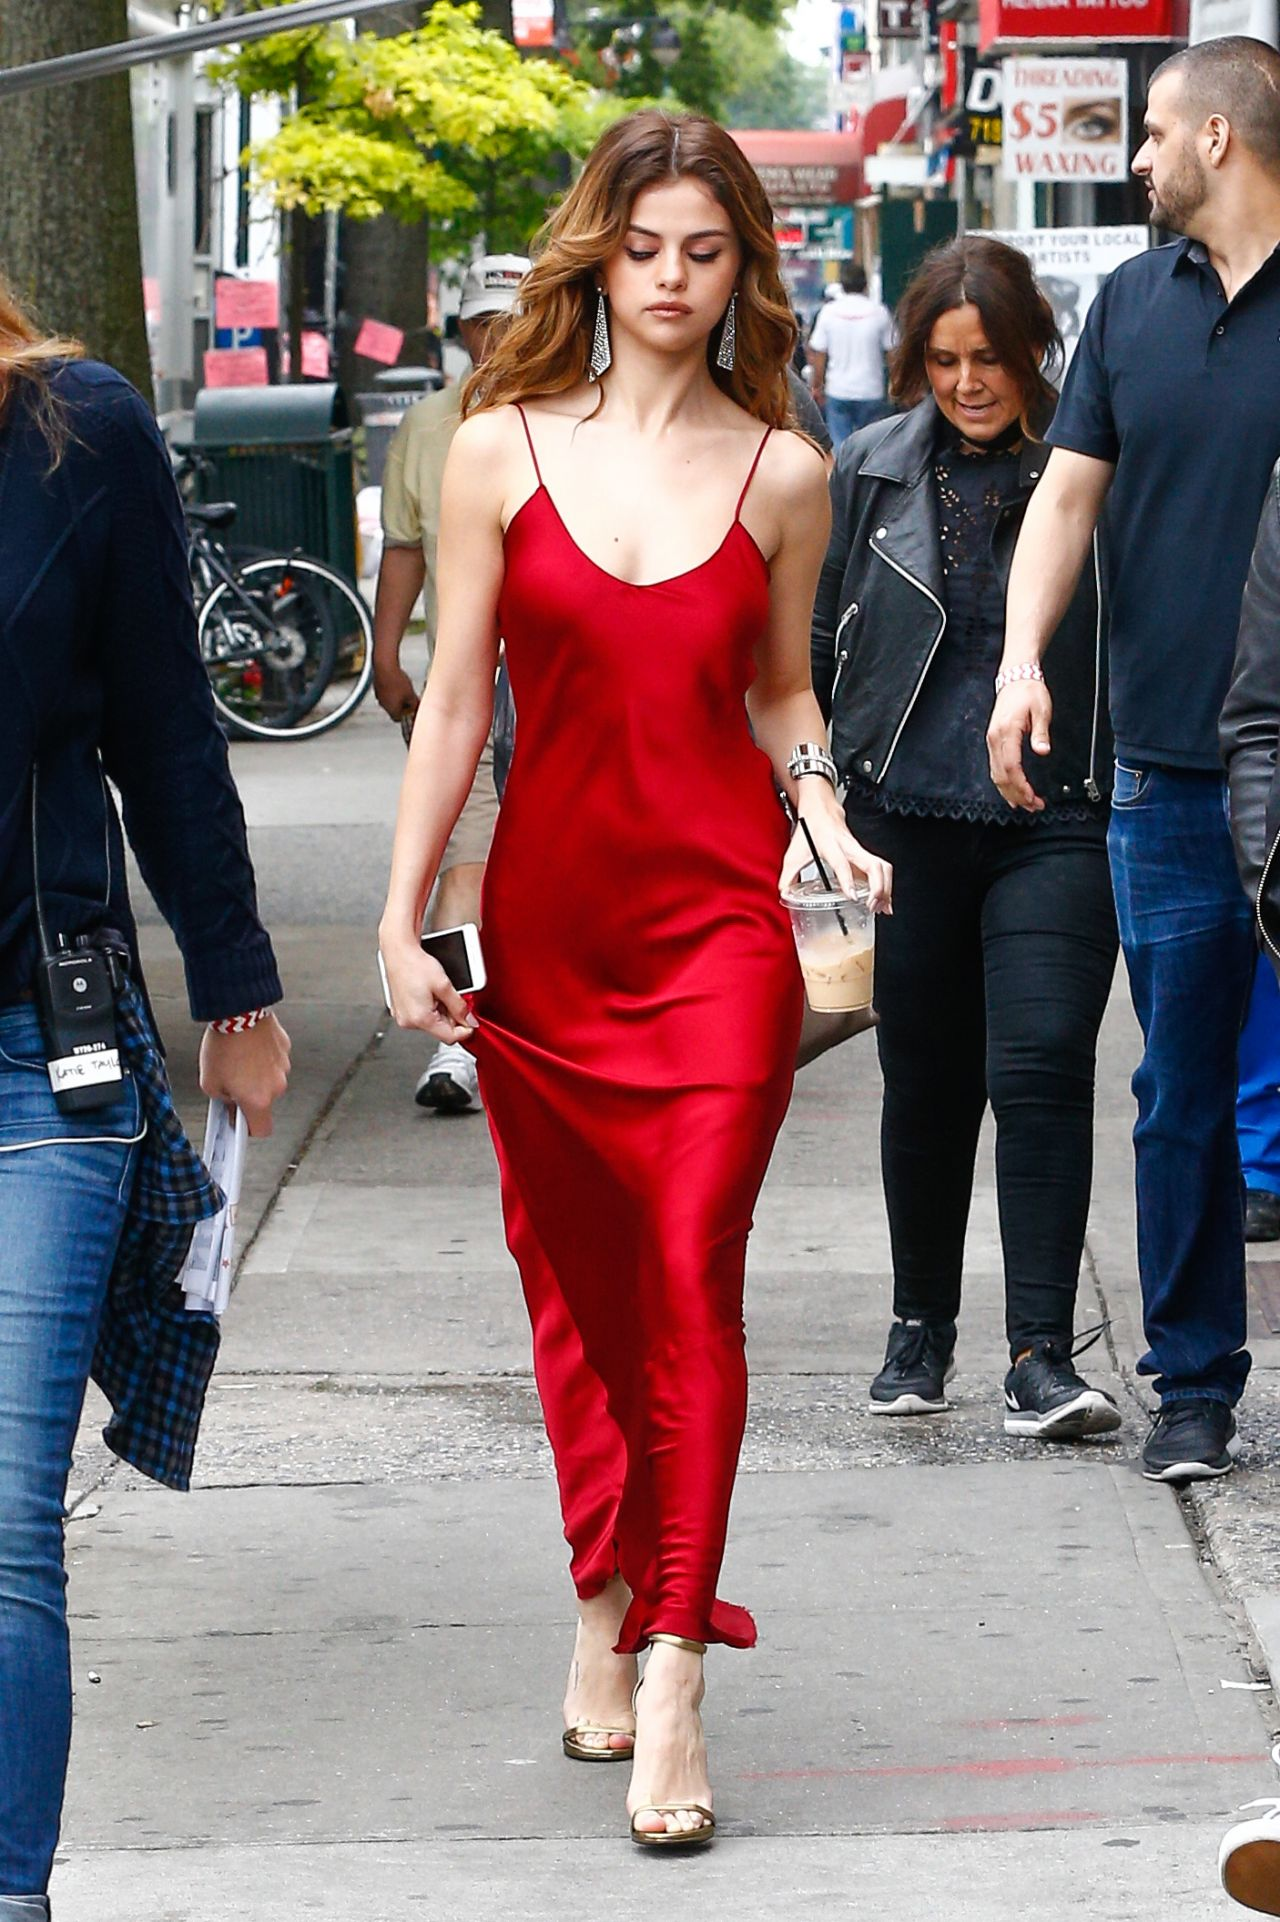 Fashion star clothes